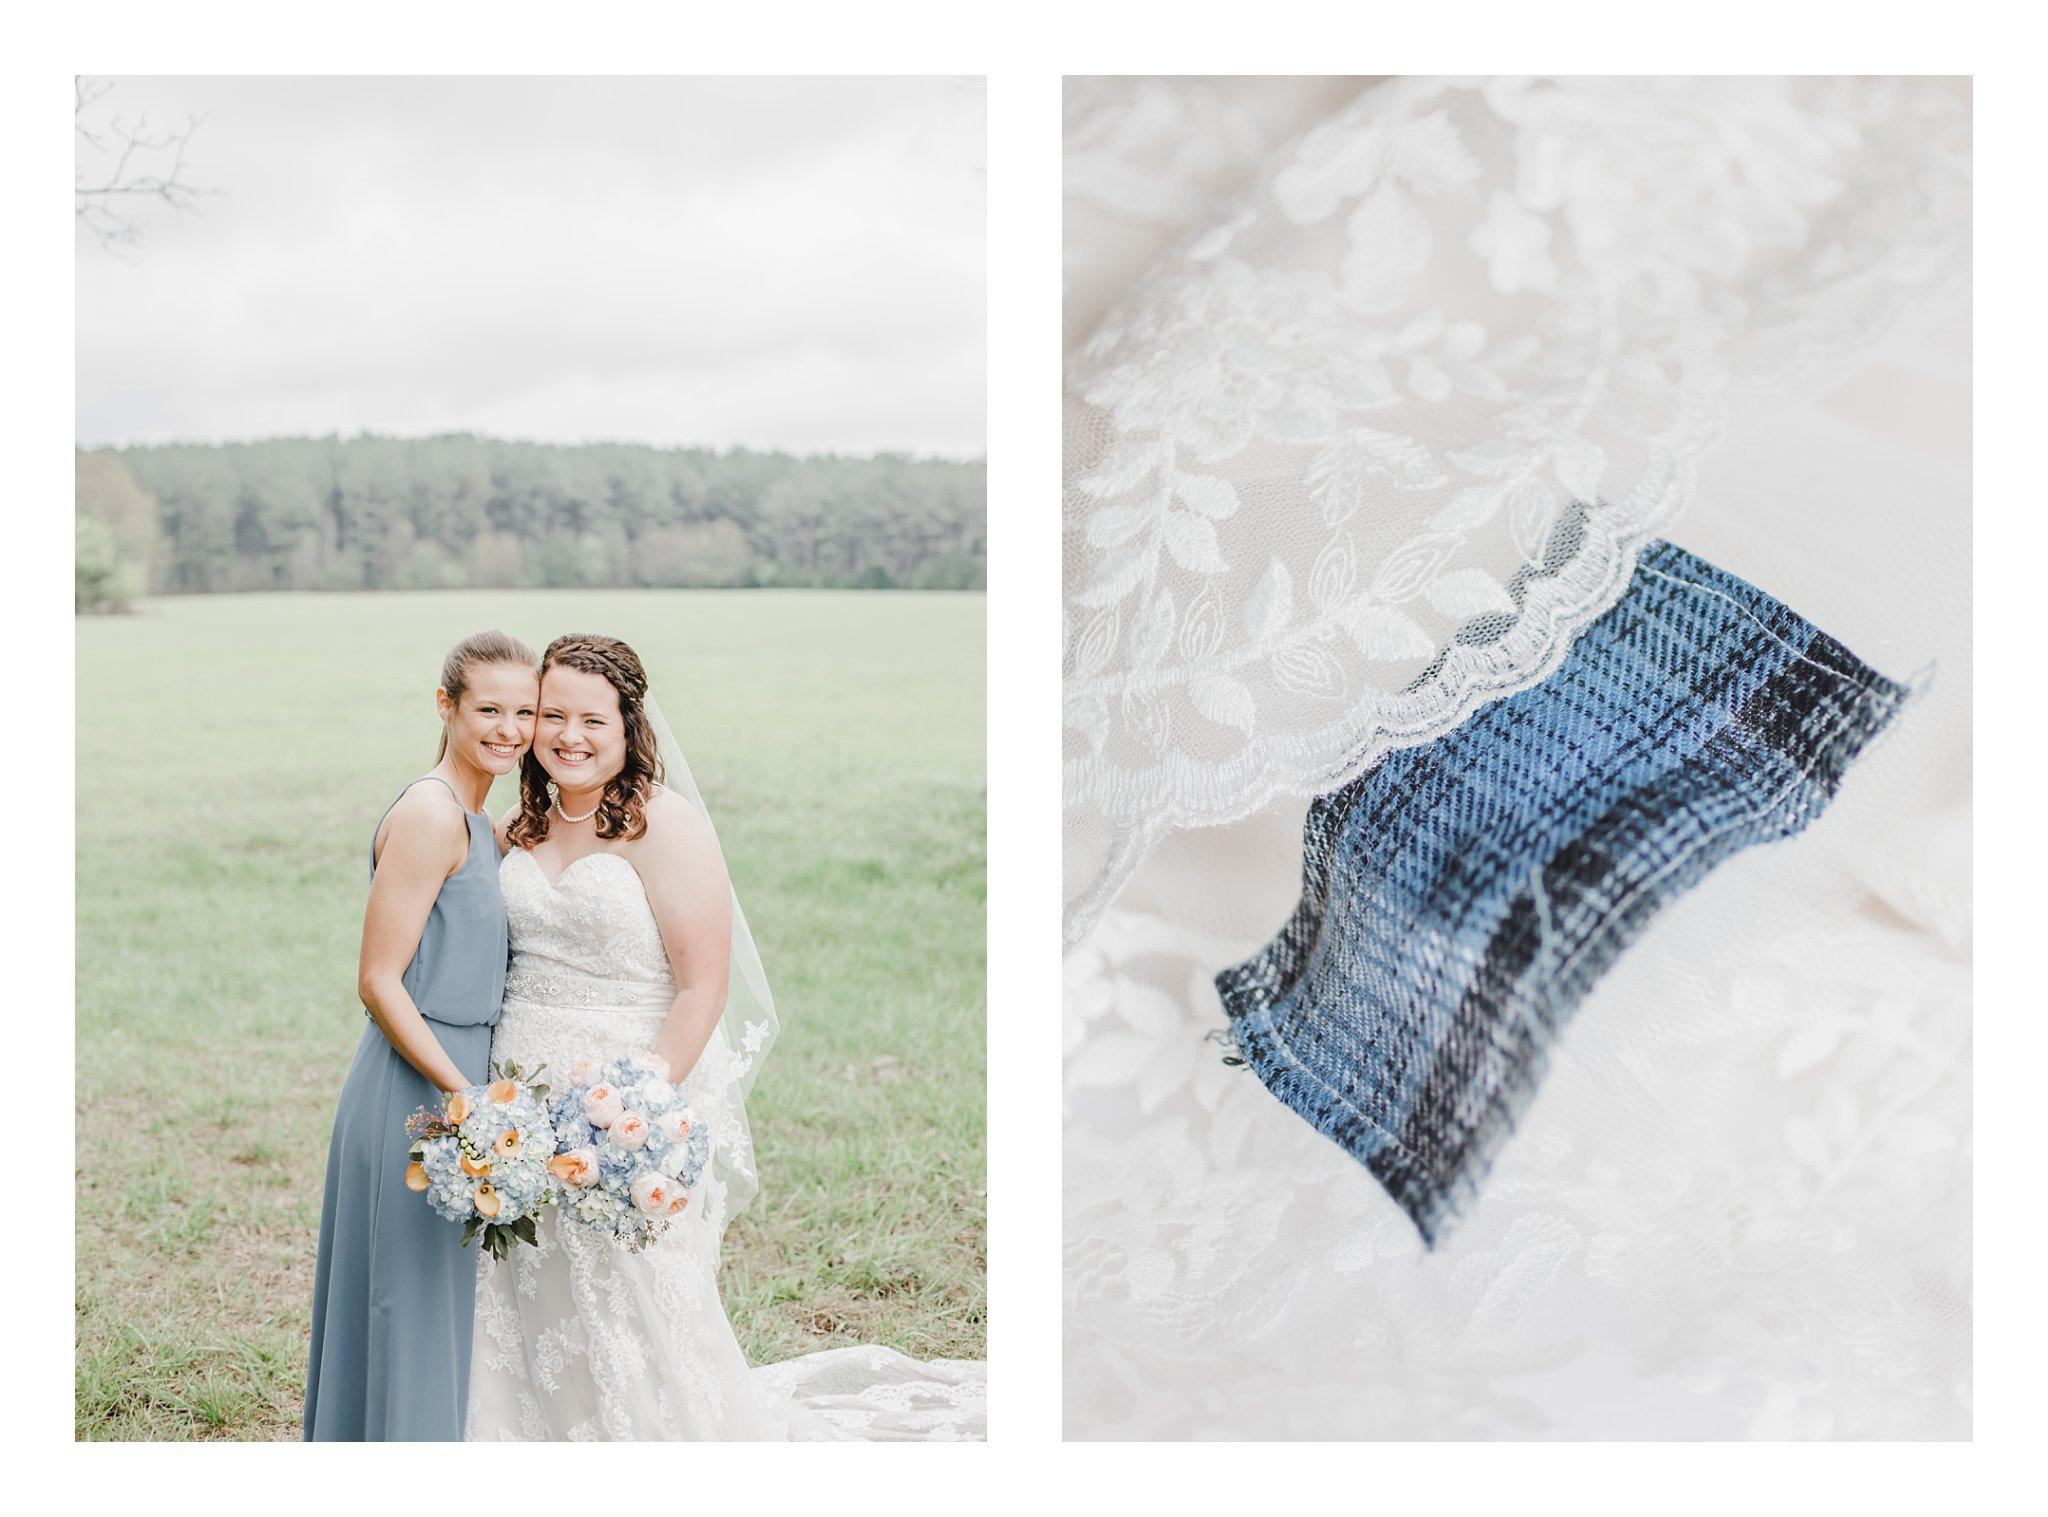 steel-blue-blush-spring-lace-gown-newberry-sc-wedding-photos-_0025.jpg